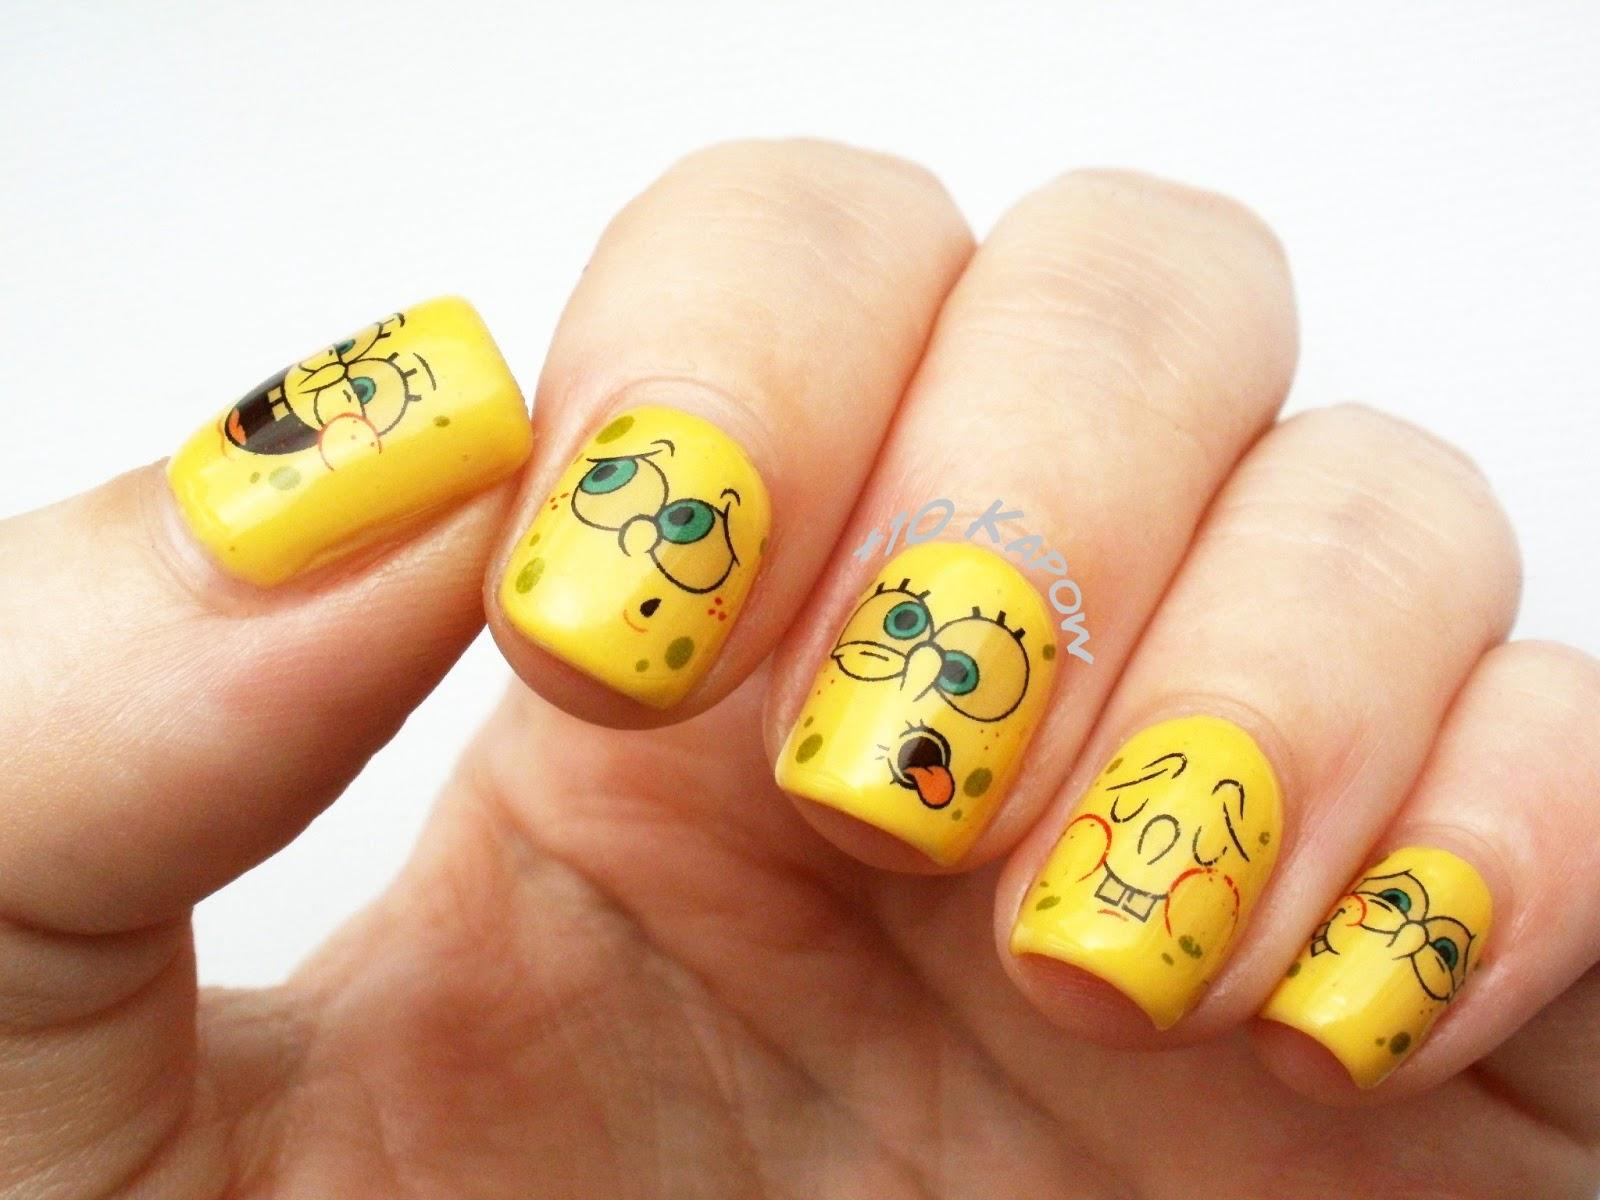 PlusKapow Spongebob Squarepants Nails - Spongebob nail decals